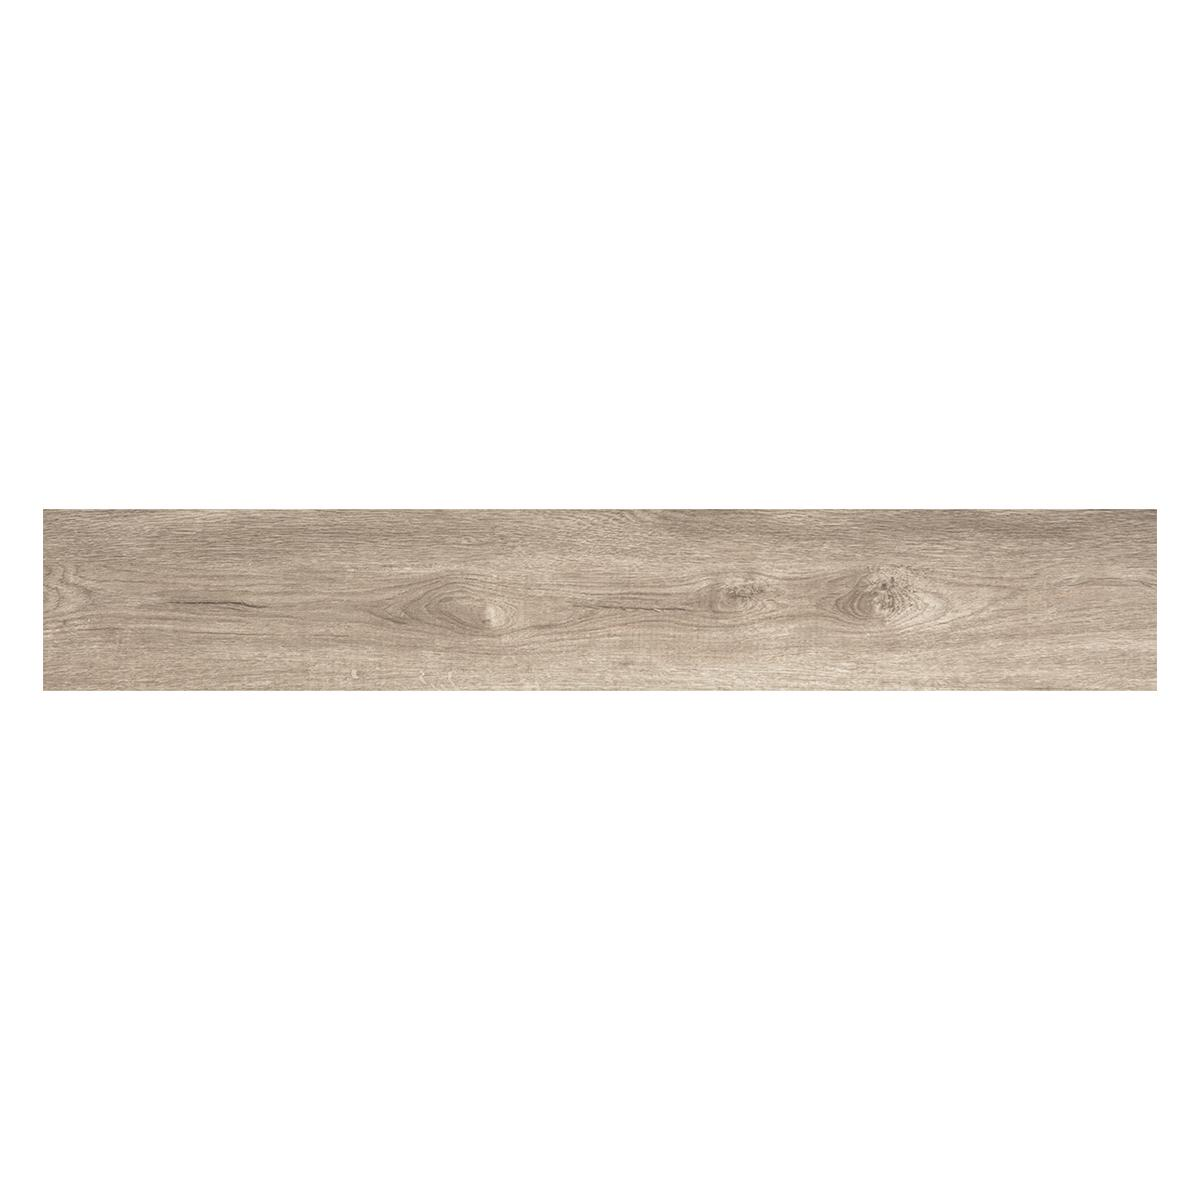 Piso Laminado Country Gris Mate - 19.9X121.5 - 2.90 m2